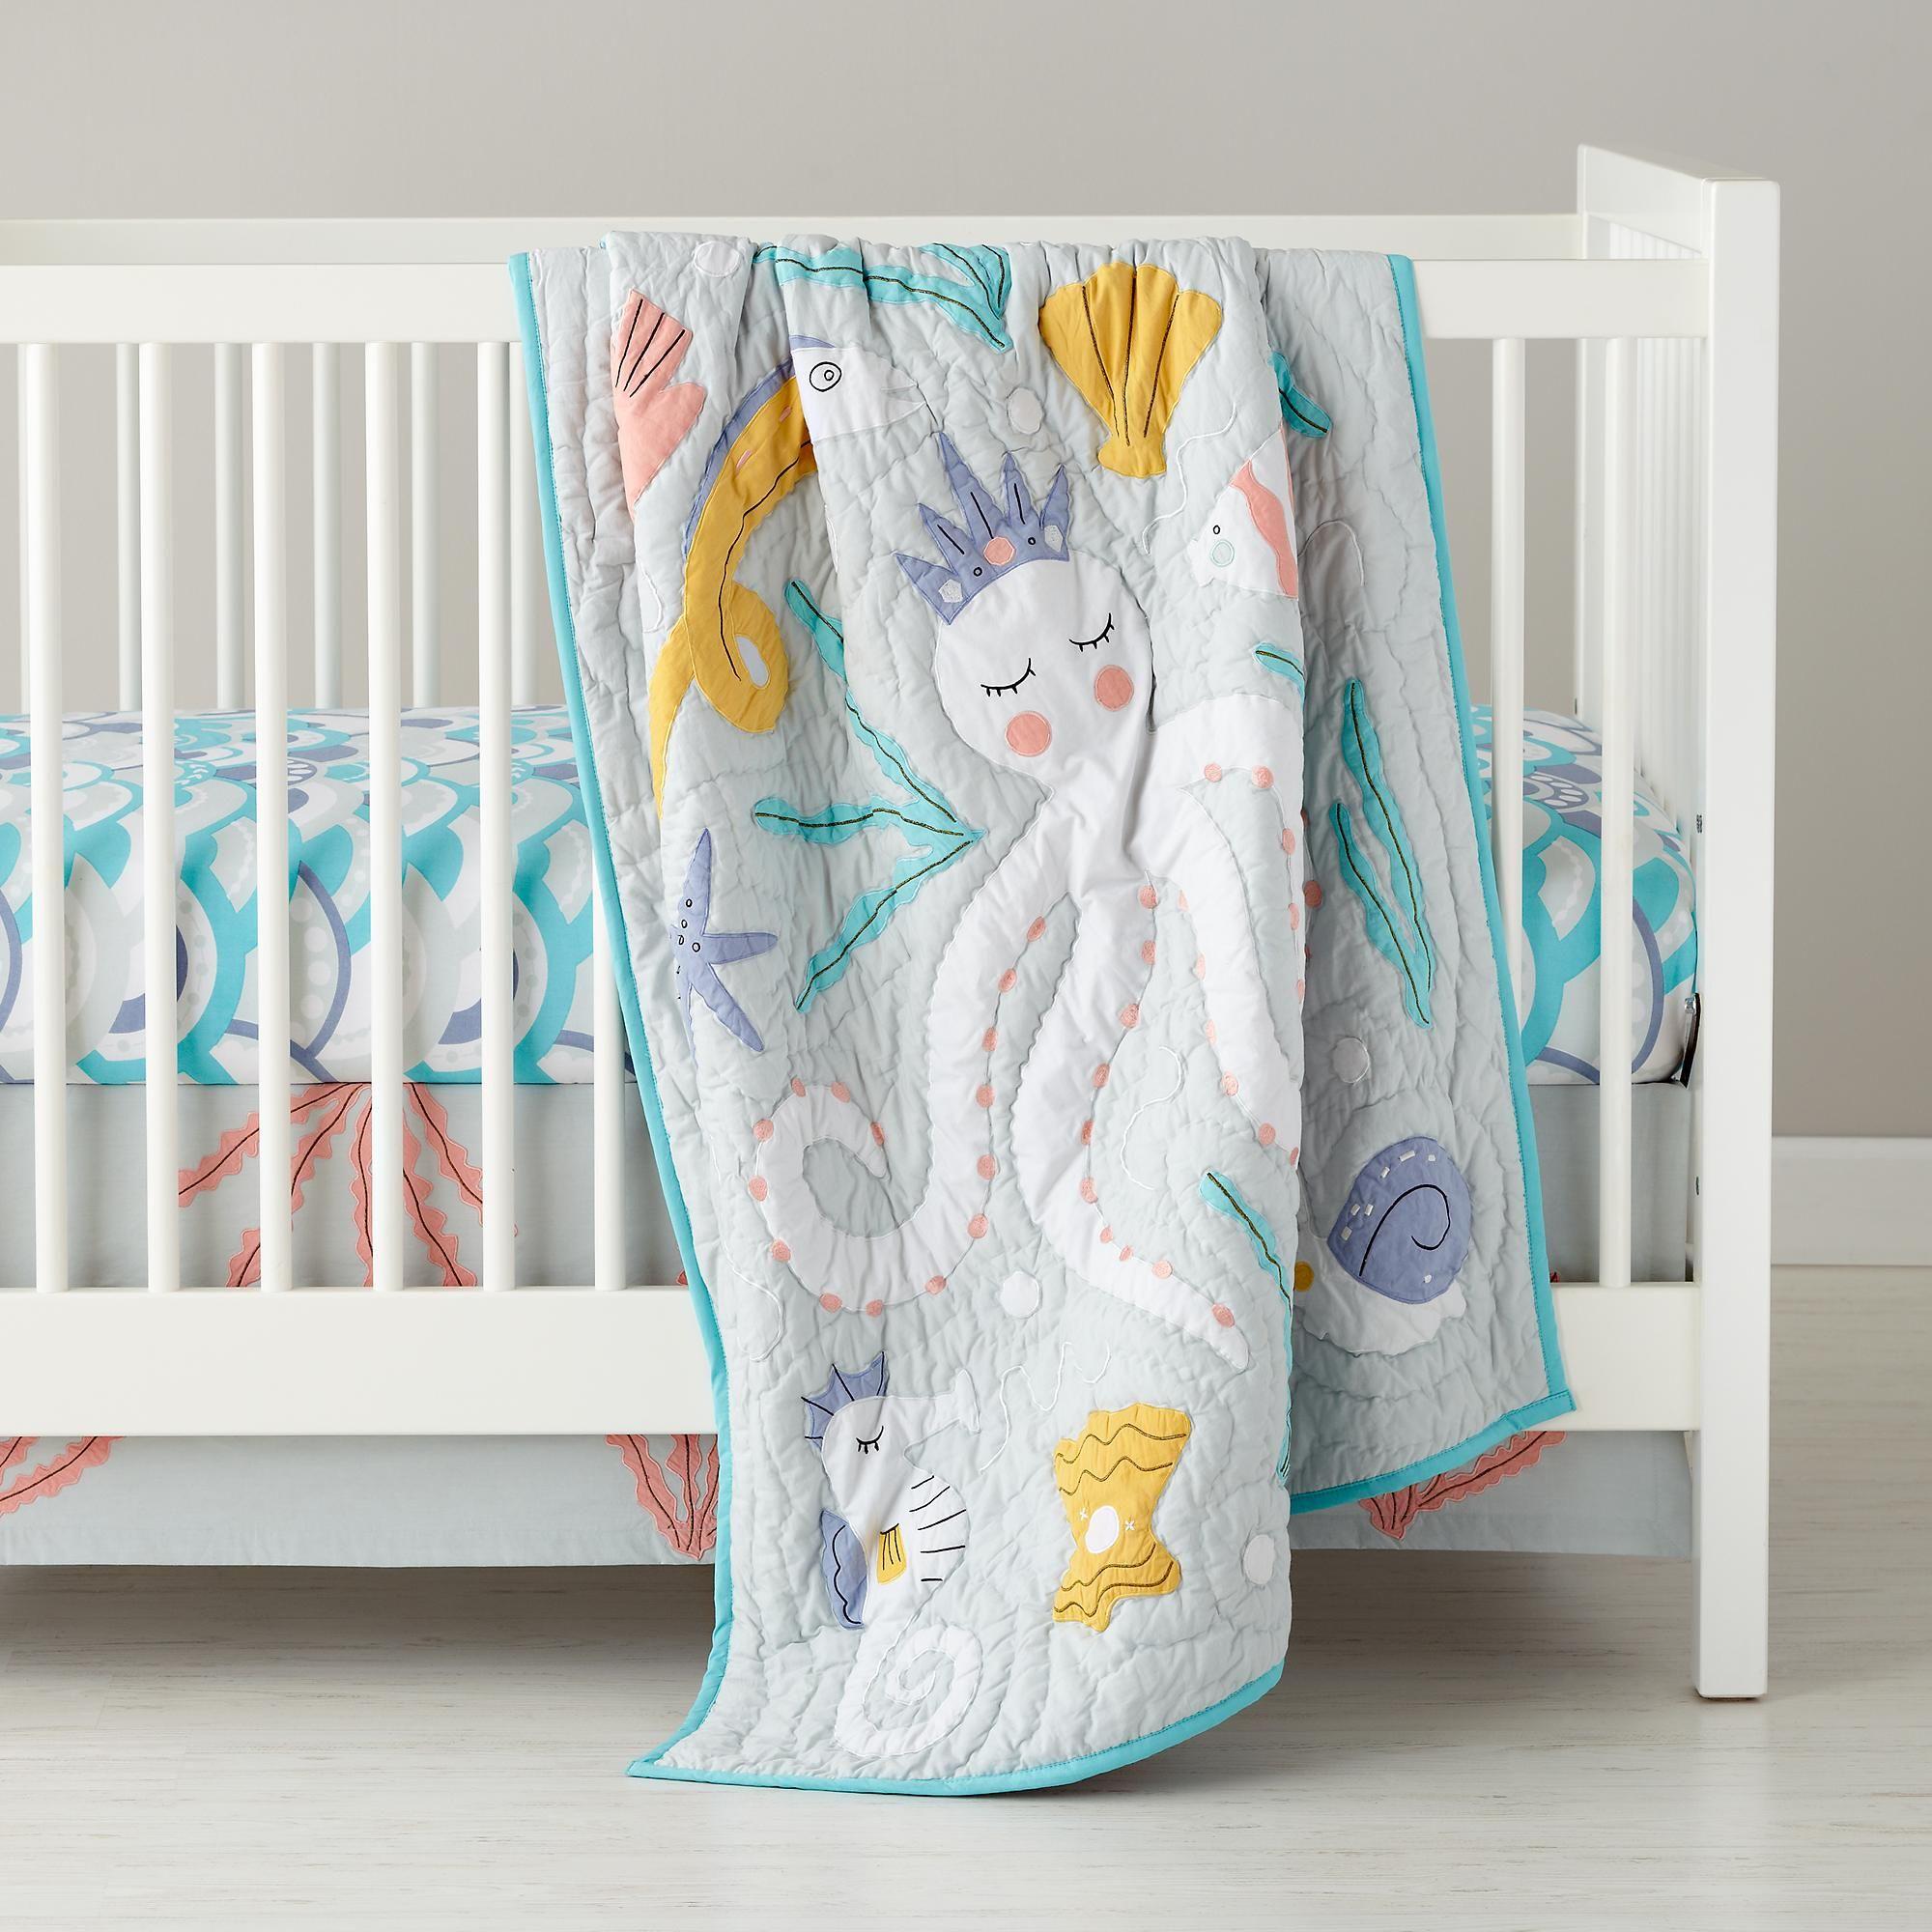 Crib for sale gatineau - The Land Of Nod Marine Queen Crib Bedding